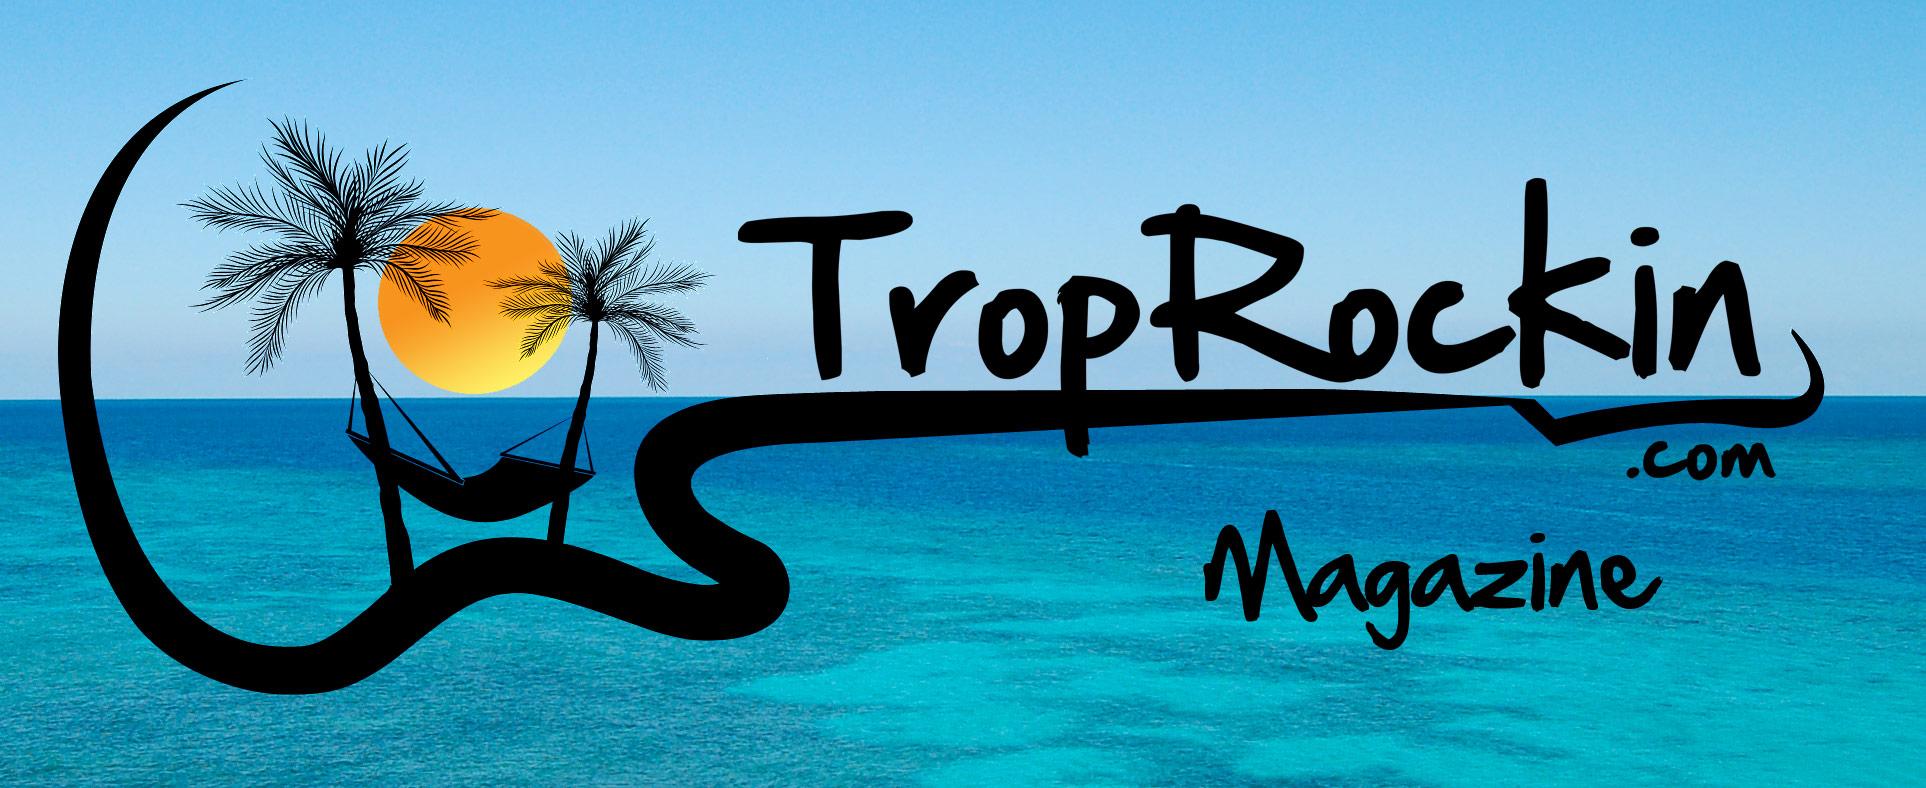 Trop-Rockin-Magazine-Logo-Black-Caribbean-Sea-Square